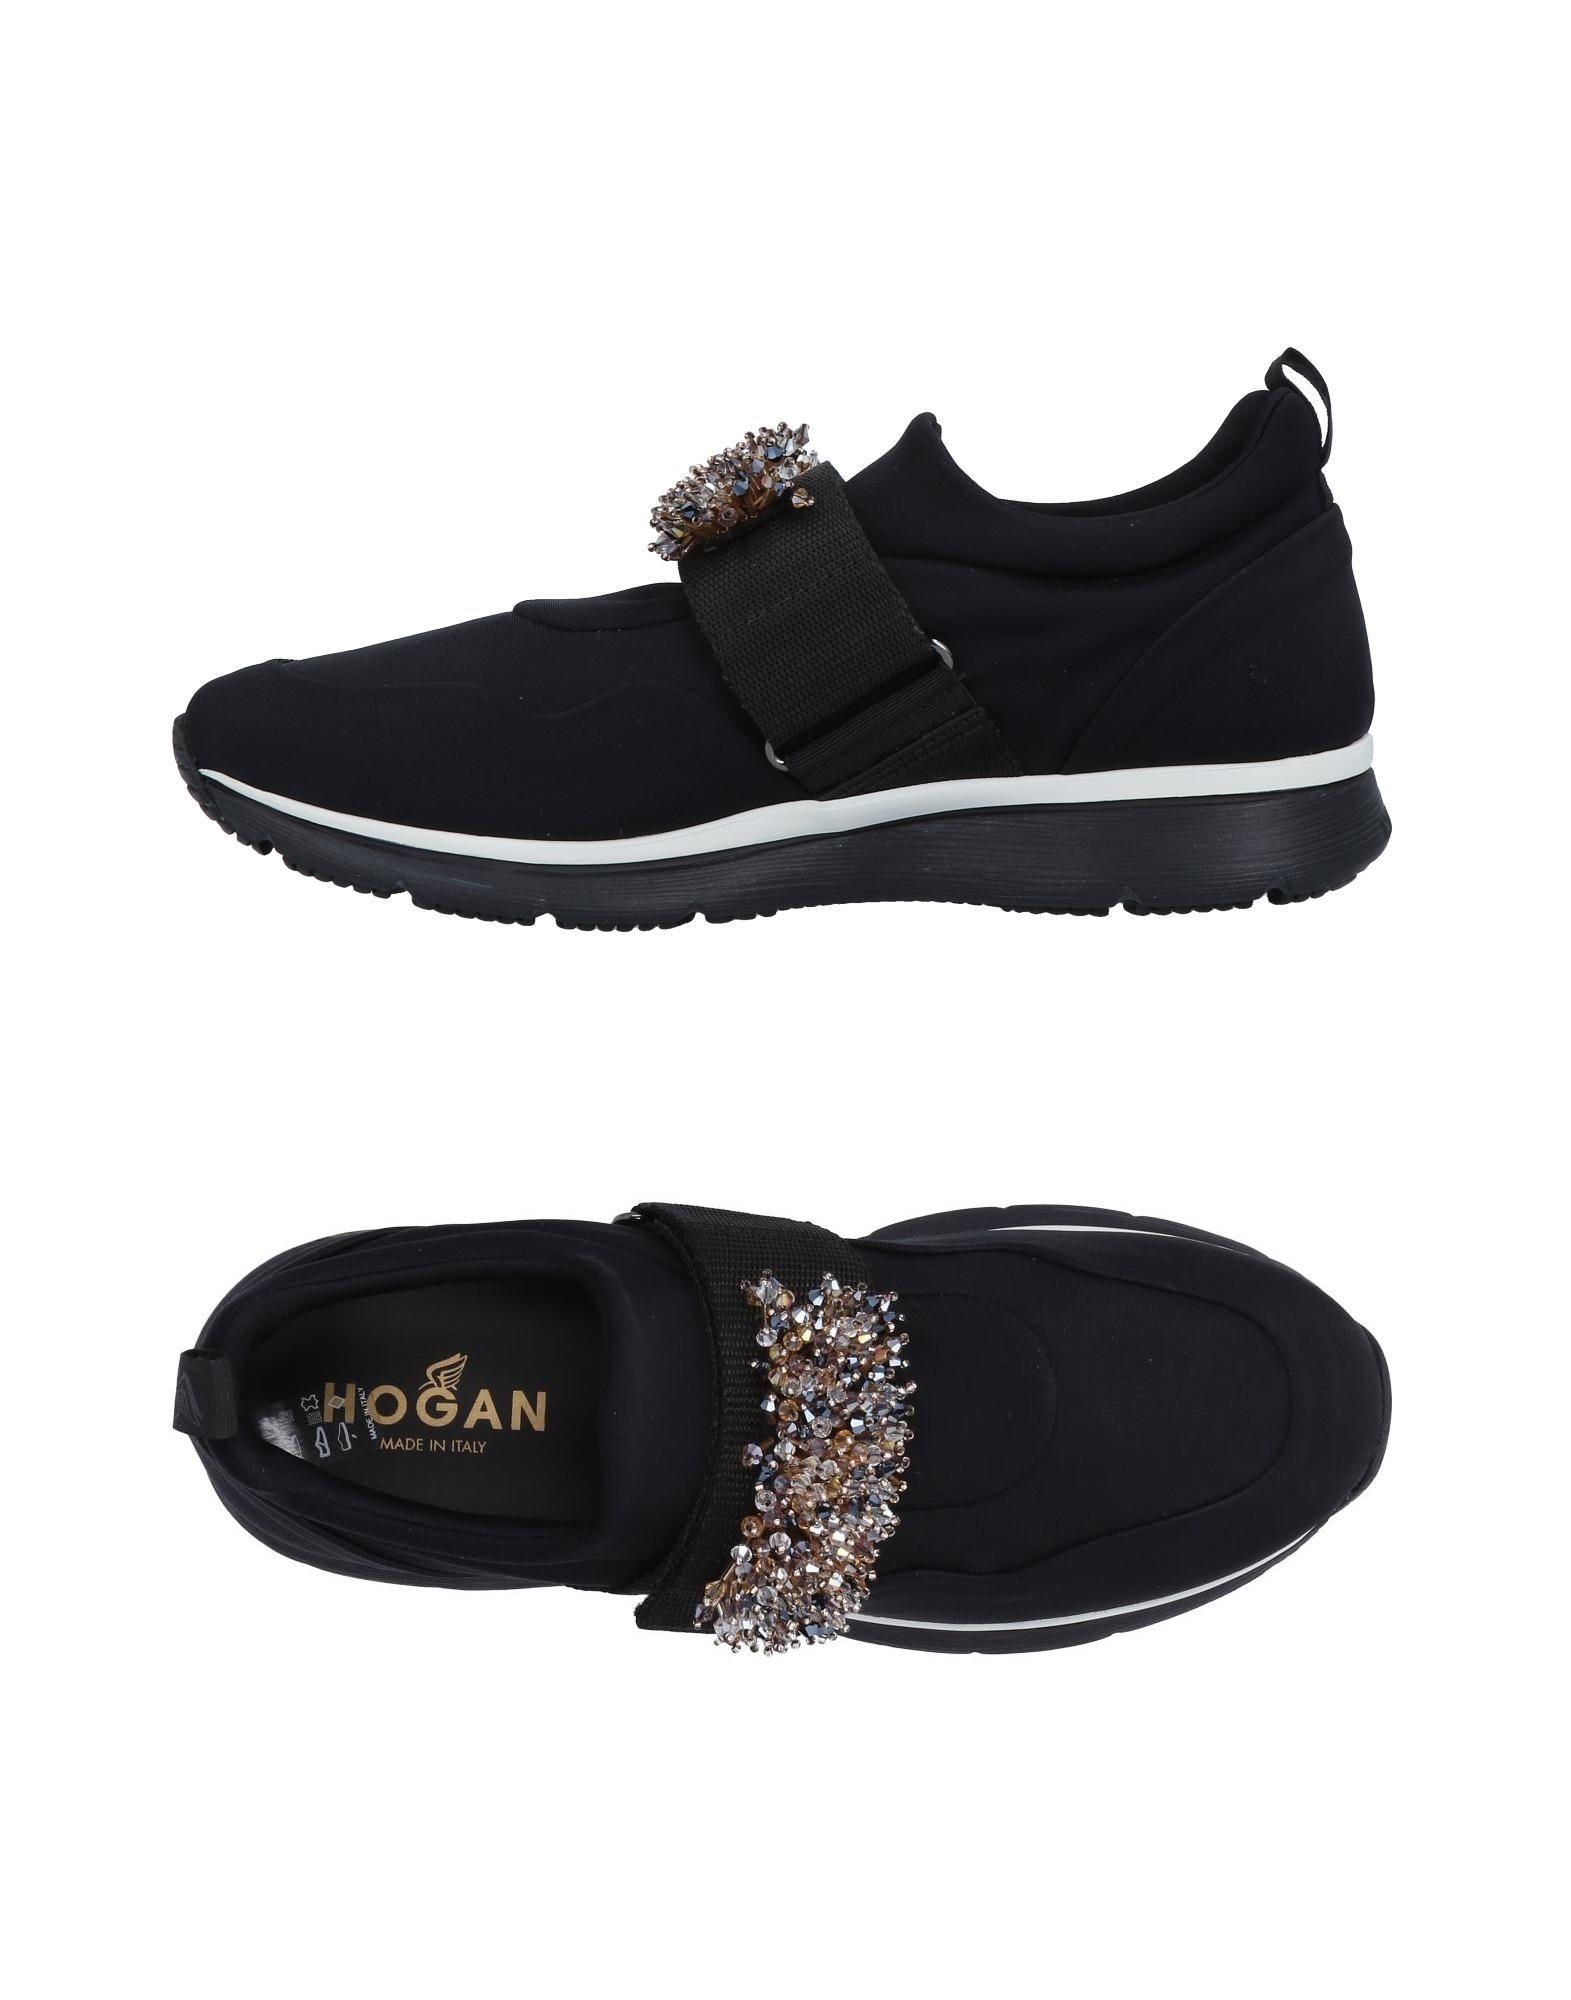 Hogan Sneakers Damen  11503522CQGut aussehende strapazierfähige Schuhe